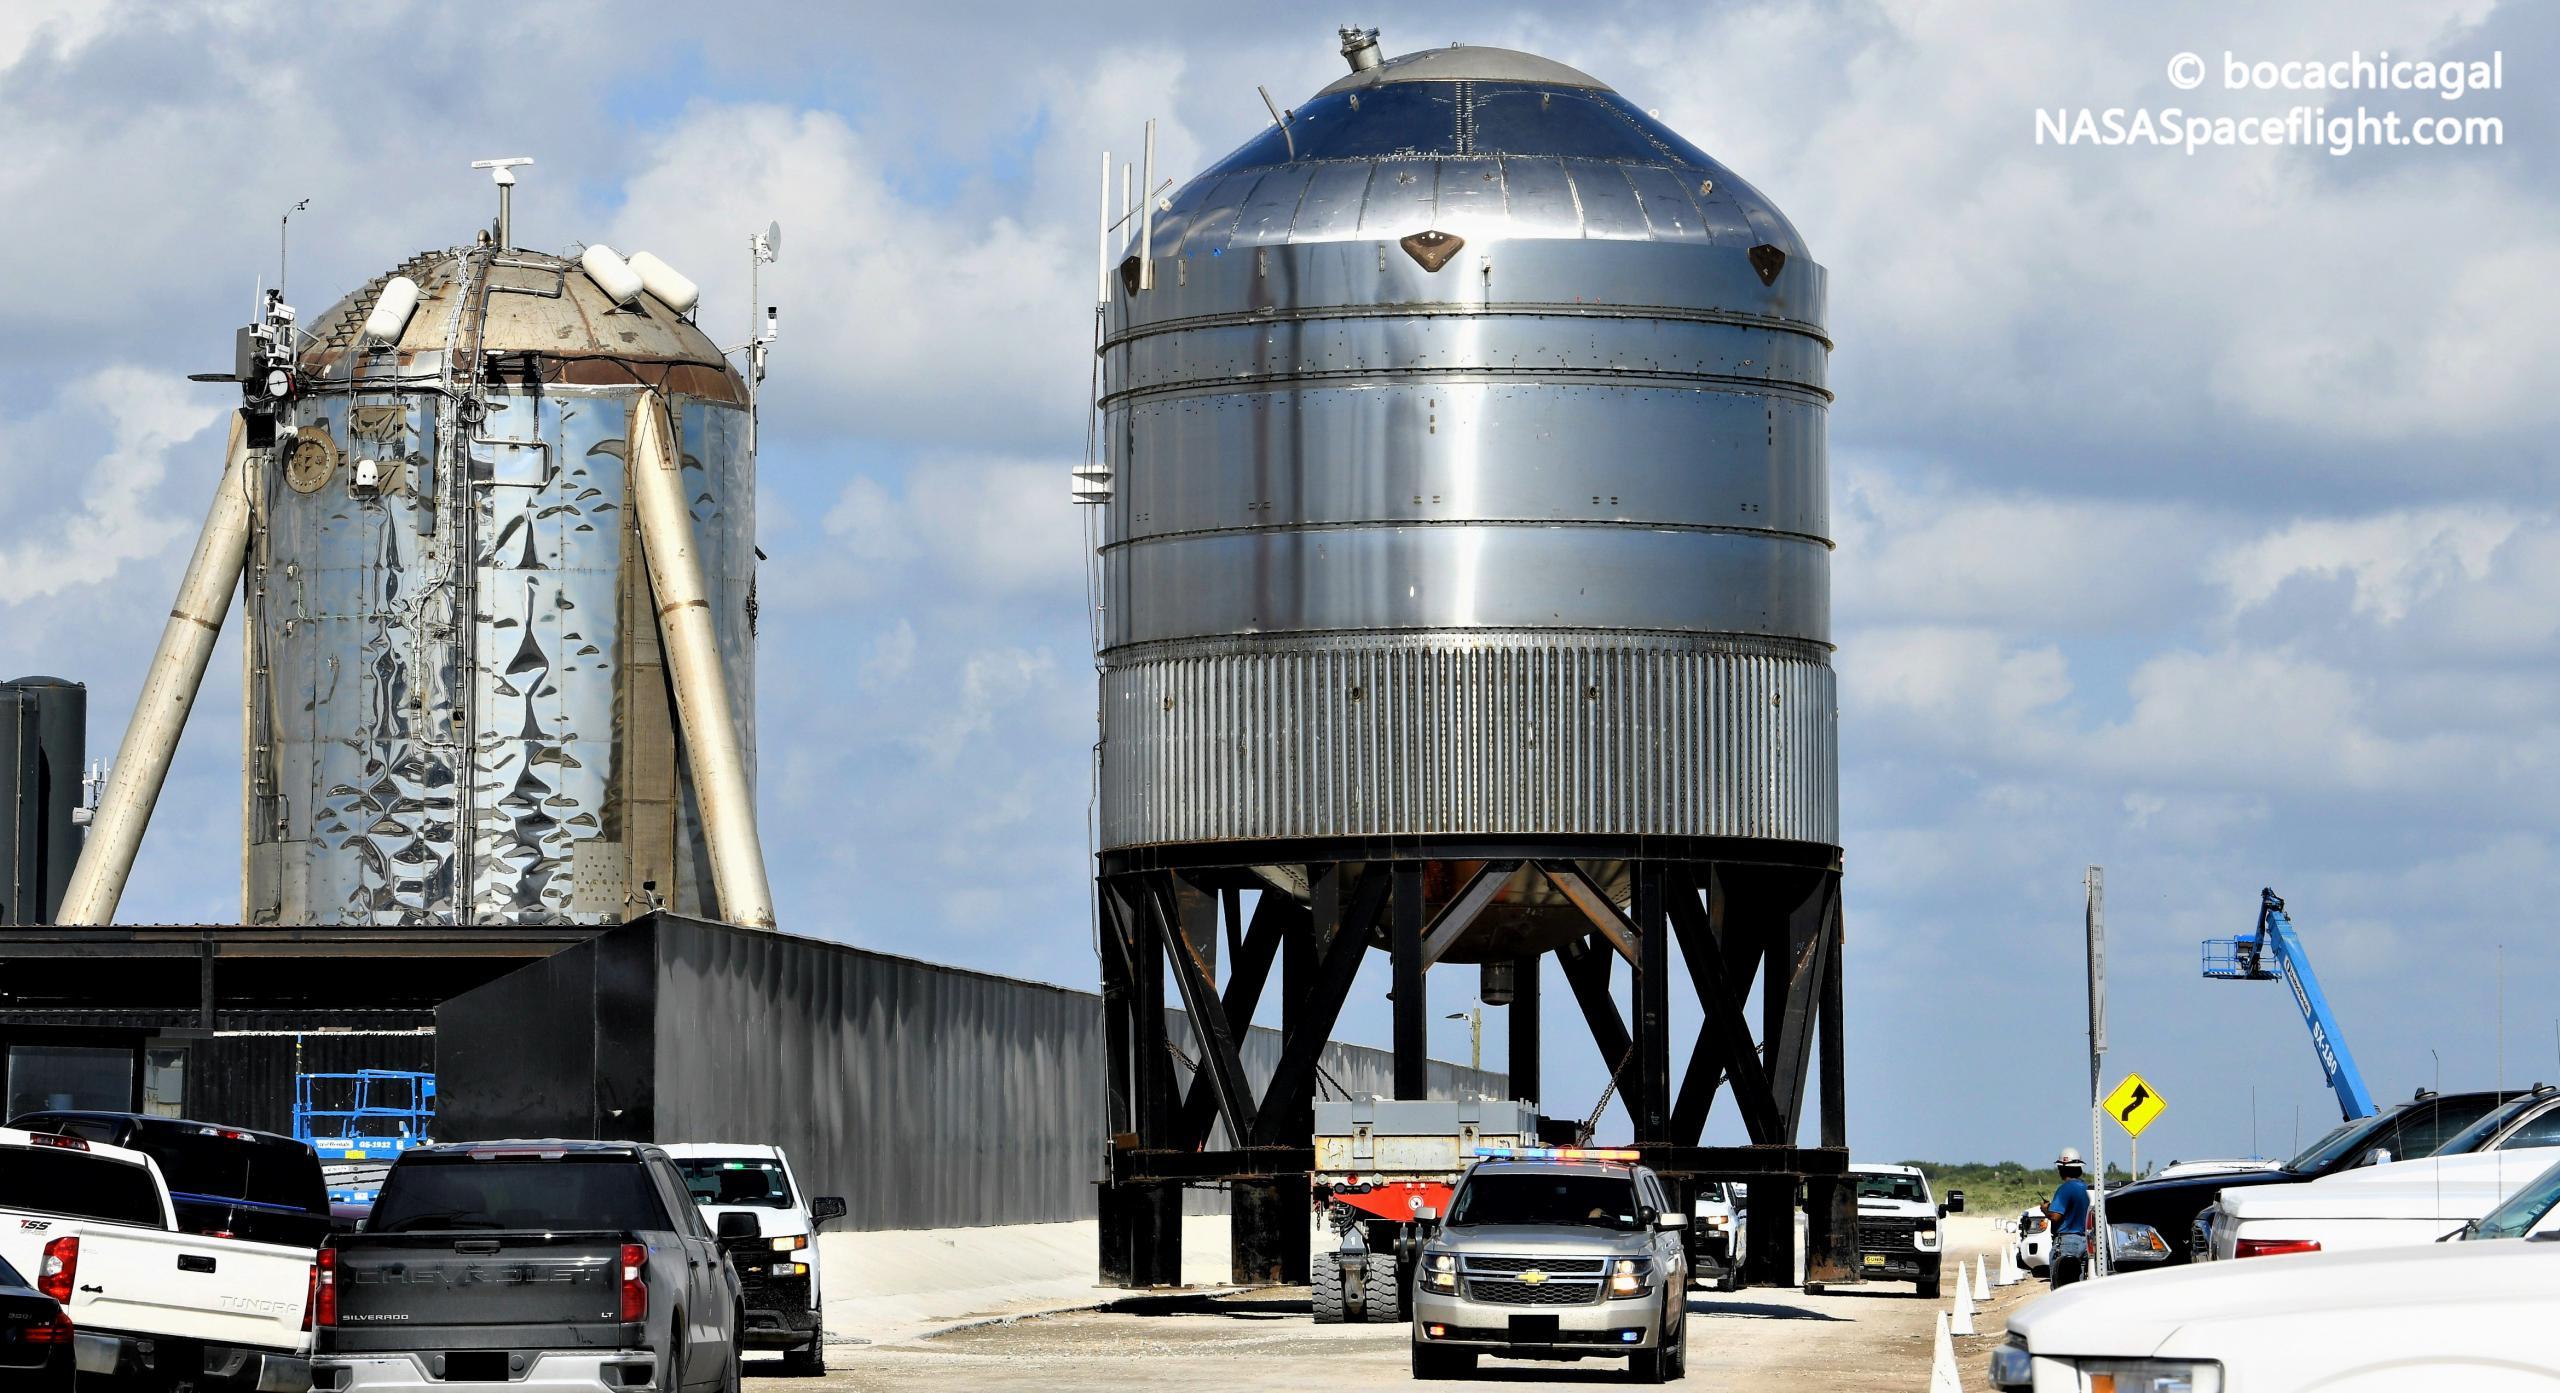 Starship Boca Chica 082321 (NASASpaceflight – bocachicagal) GSE4 test tank 2 crop (c)